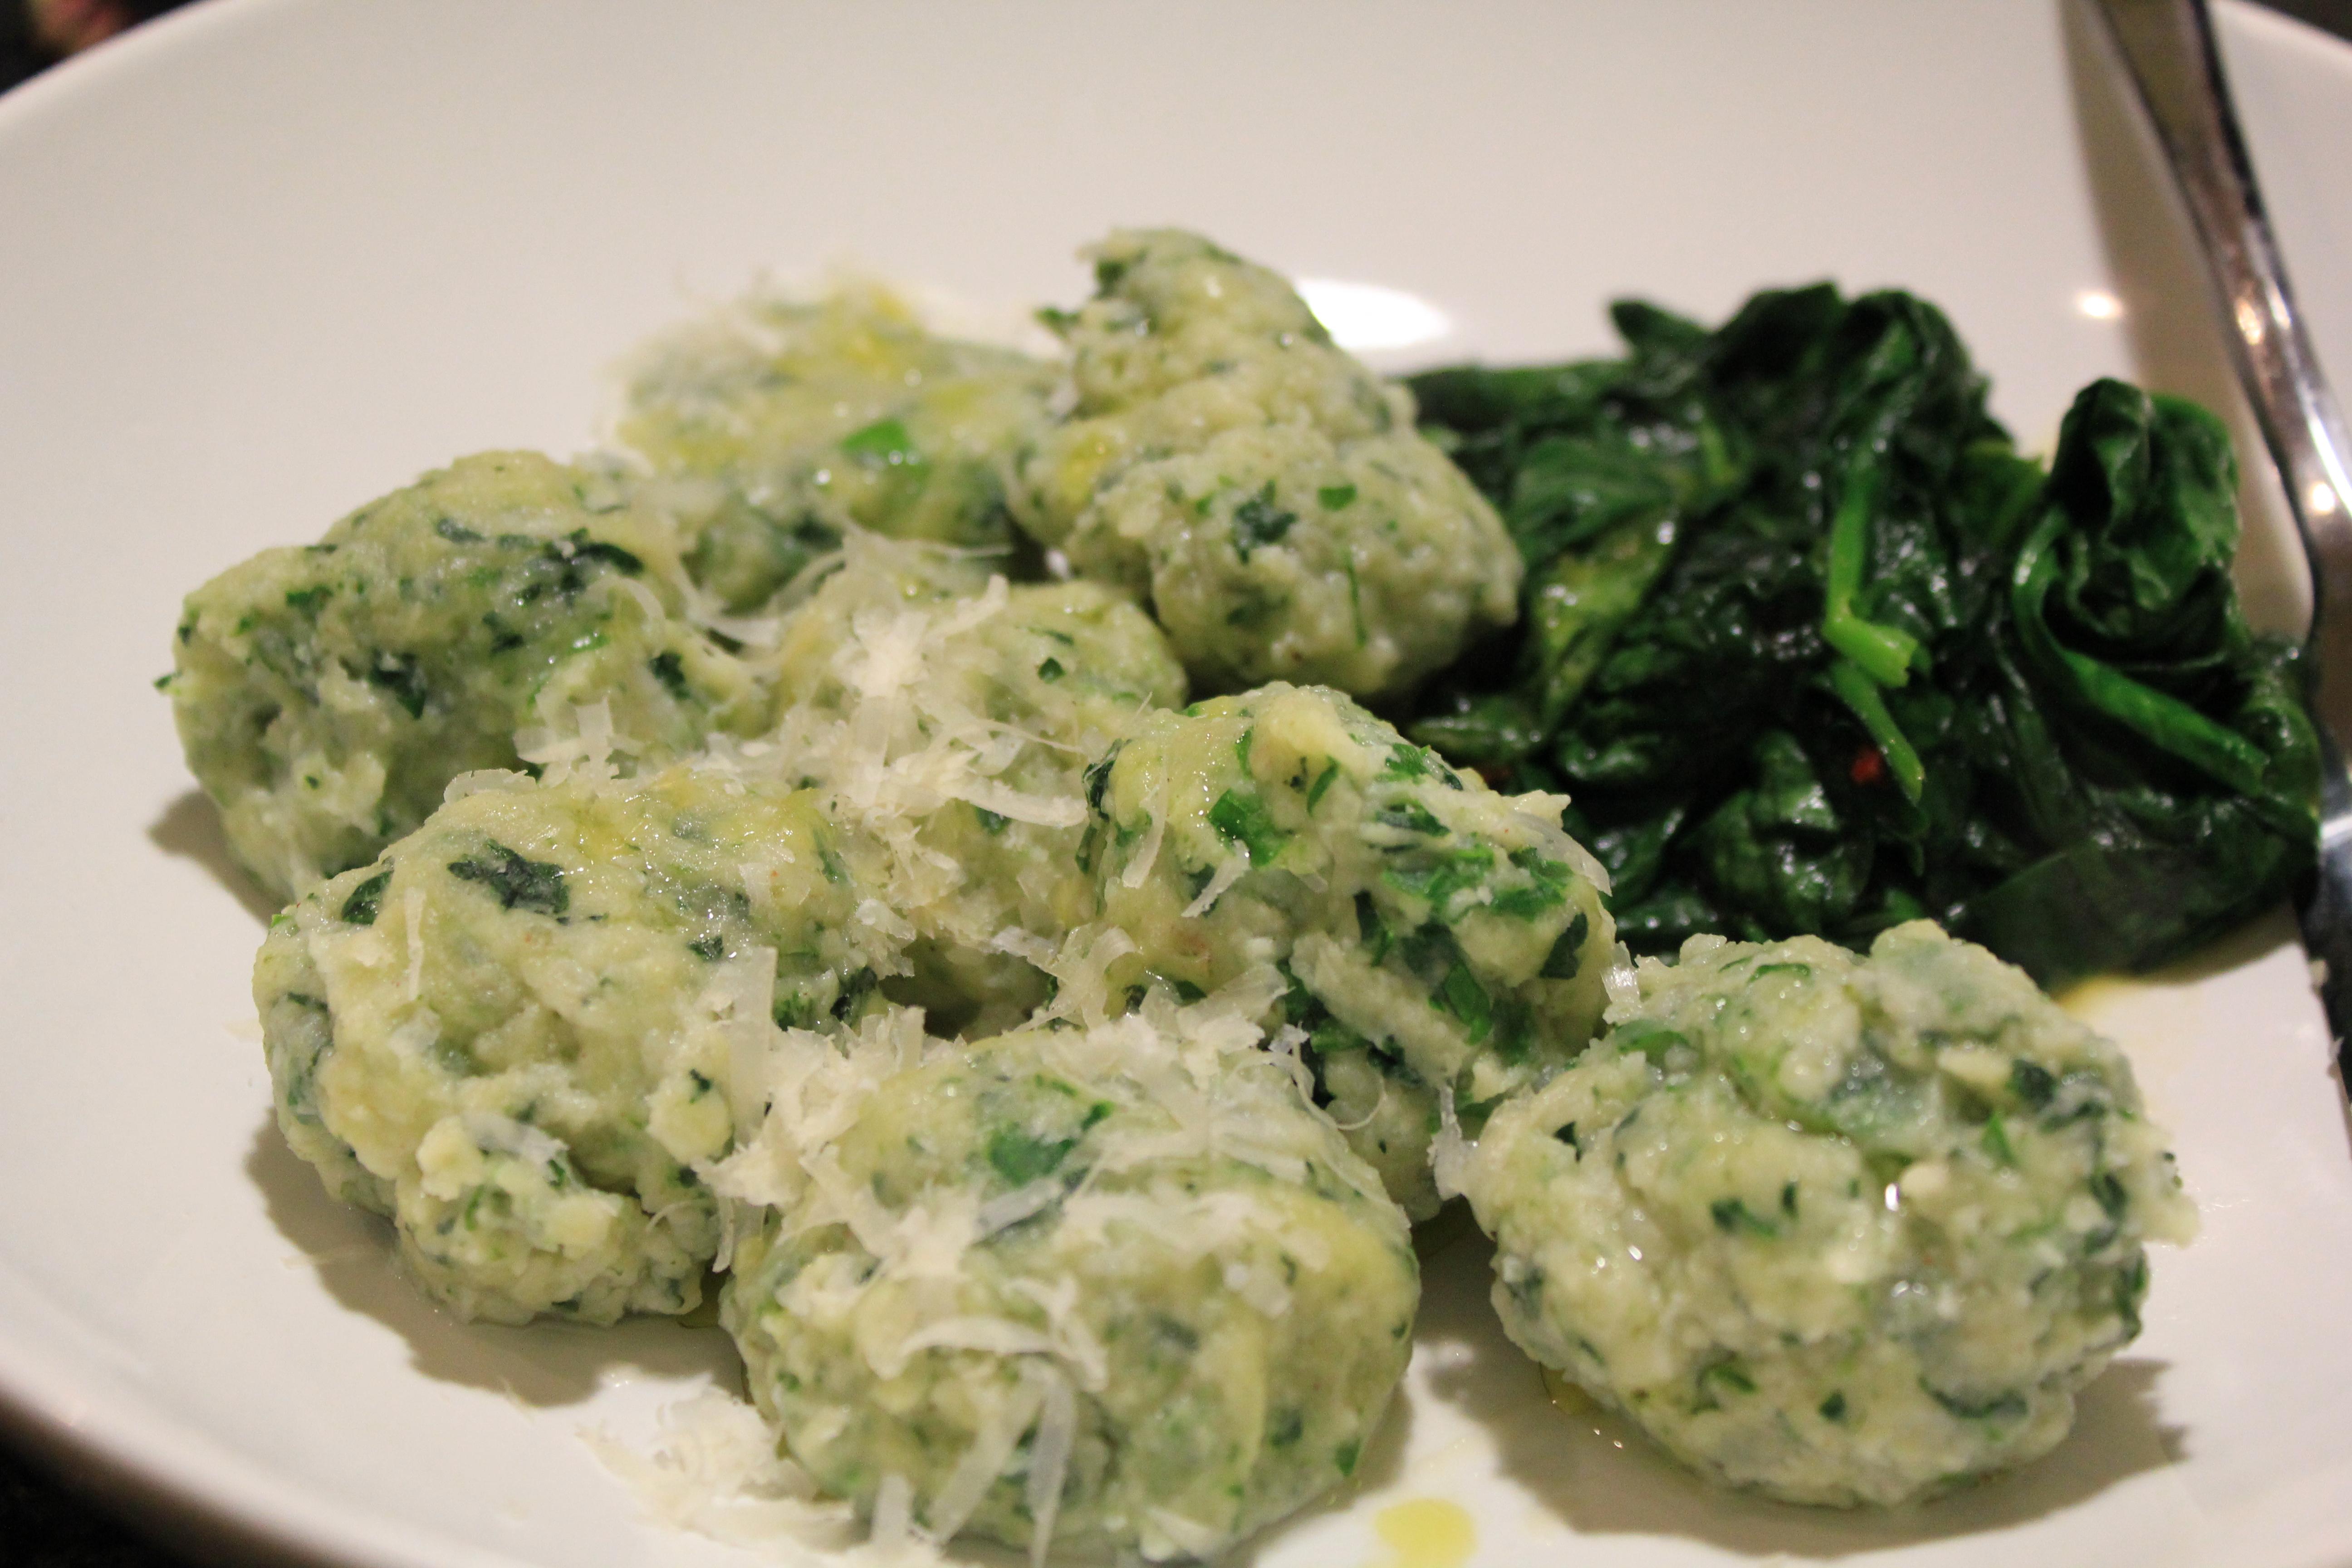 Spinach and Arugula Gnocchi Clara Persis